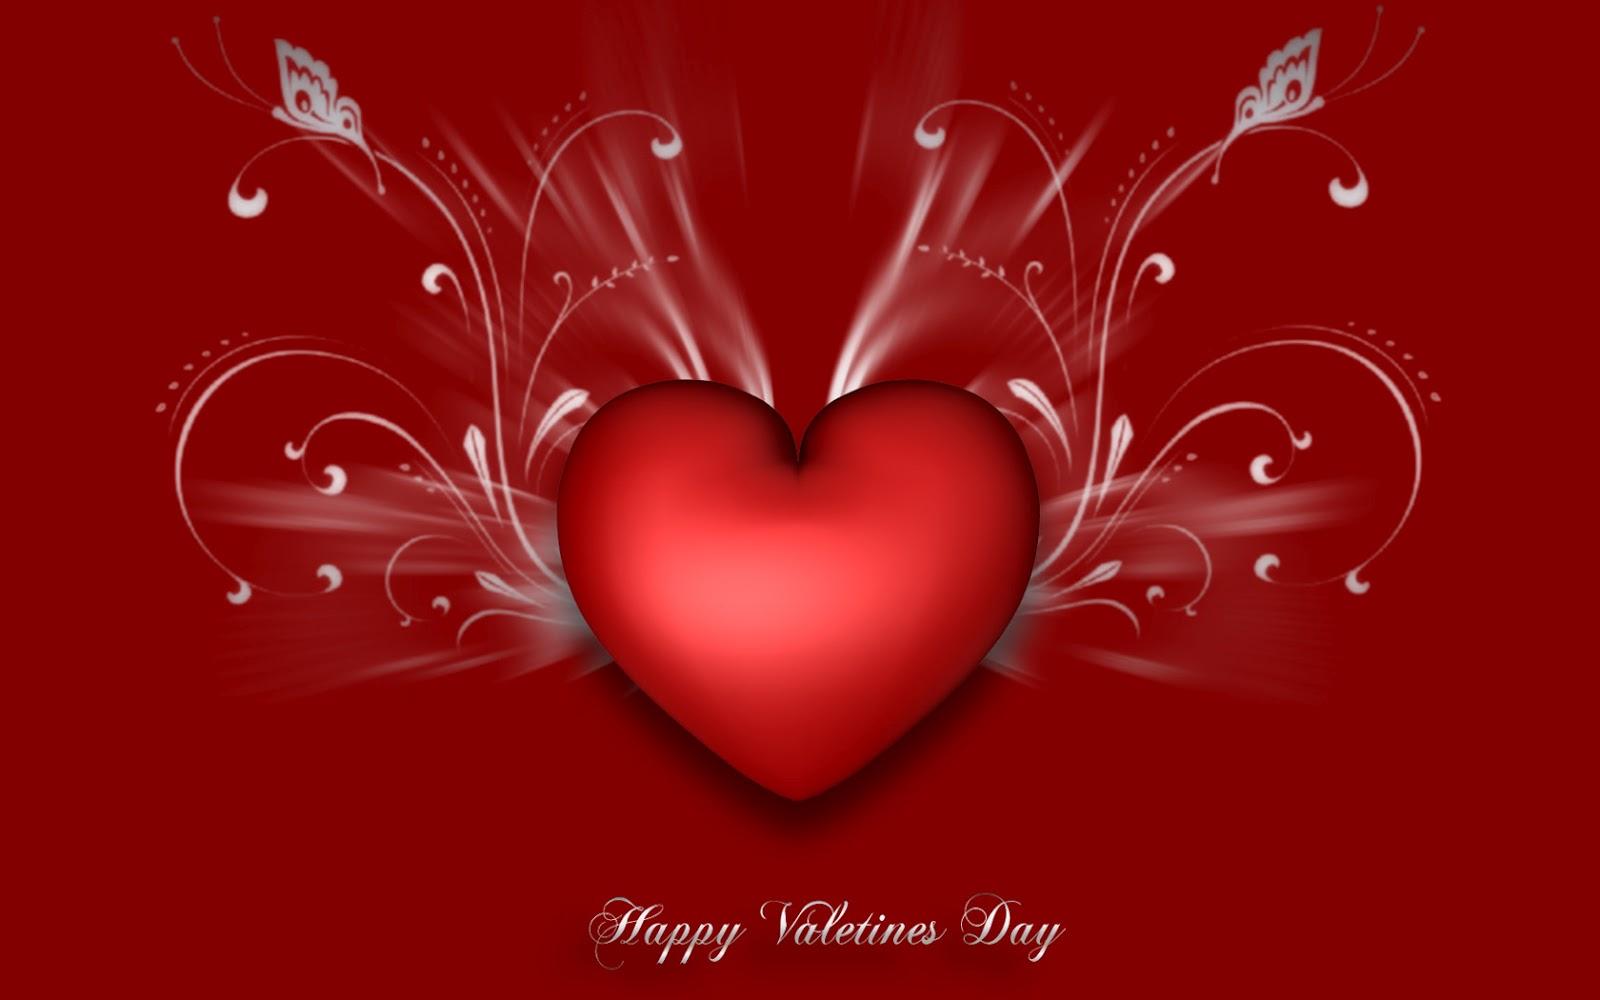 http://4.bp.blogspot.com/-zHdyc5nU-8Y/TzqNUr7bYJI/AAAAAAAAAgg/qOtcAqPX8g4/s1600/Happy-Valentines-Day-Wallpaper-09.jpg